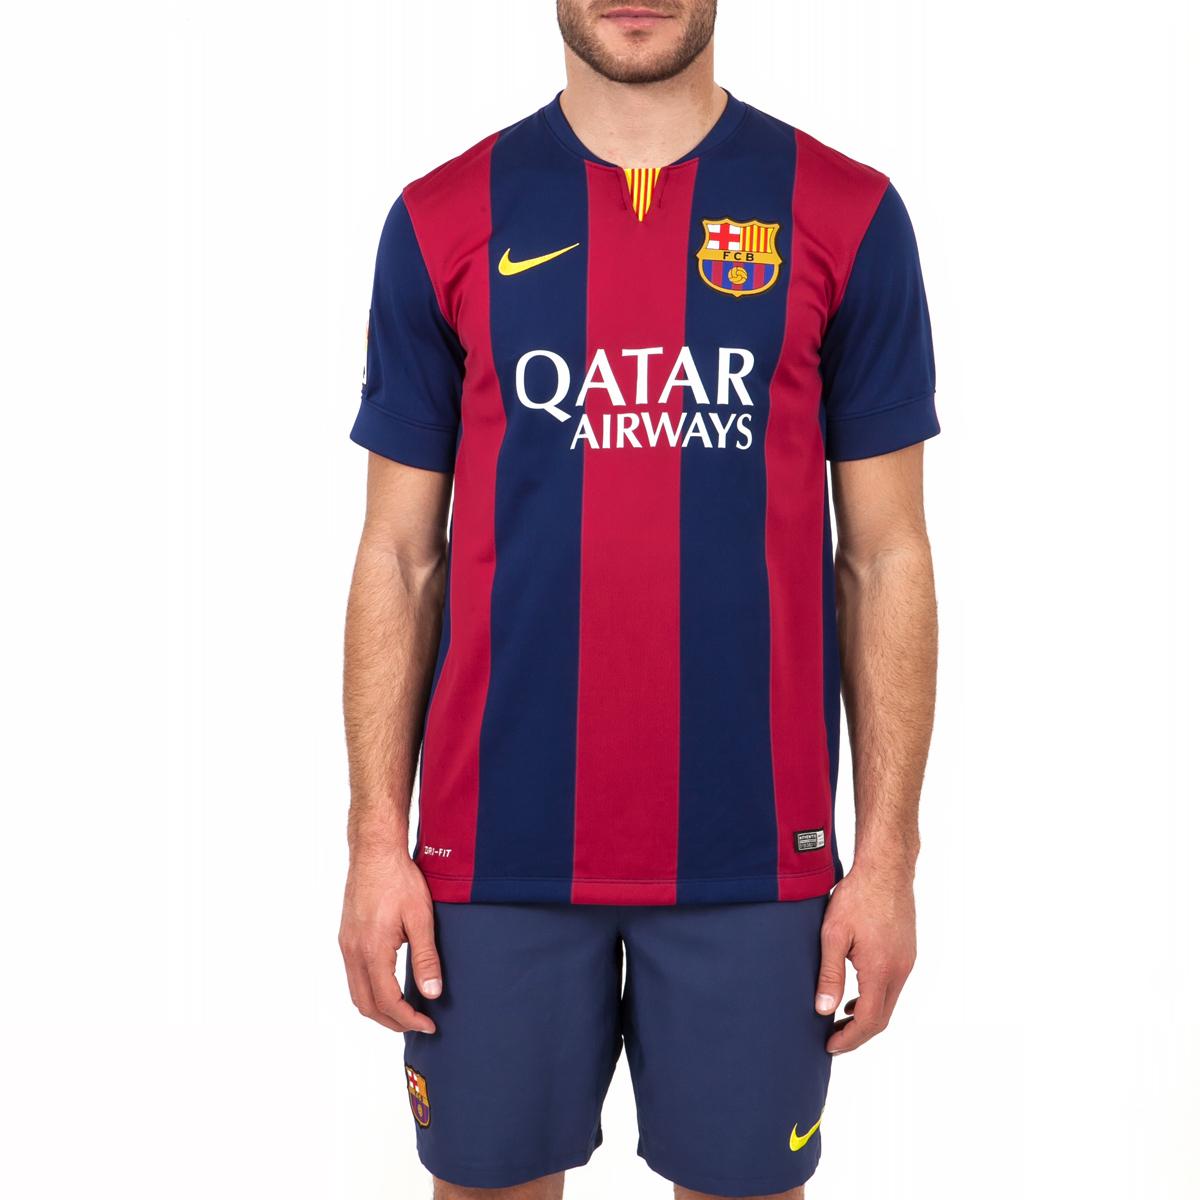 NIKE - Ανδρική μπλούζα Nike FC Barcelona μπλε-μπορντώ ανδρικά ρούχα αθλητικά t shirt